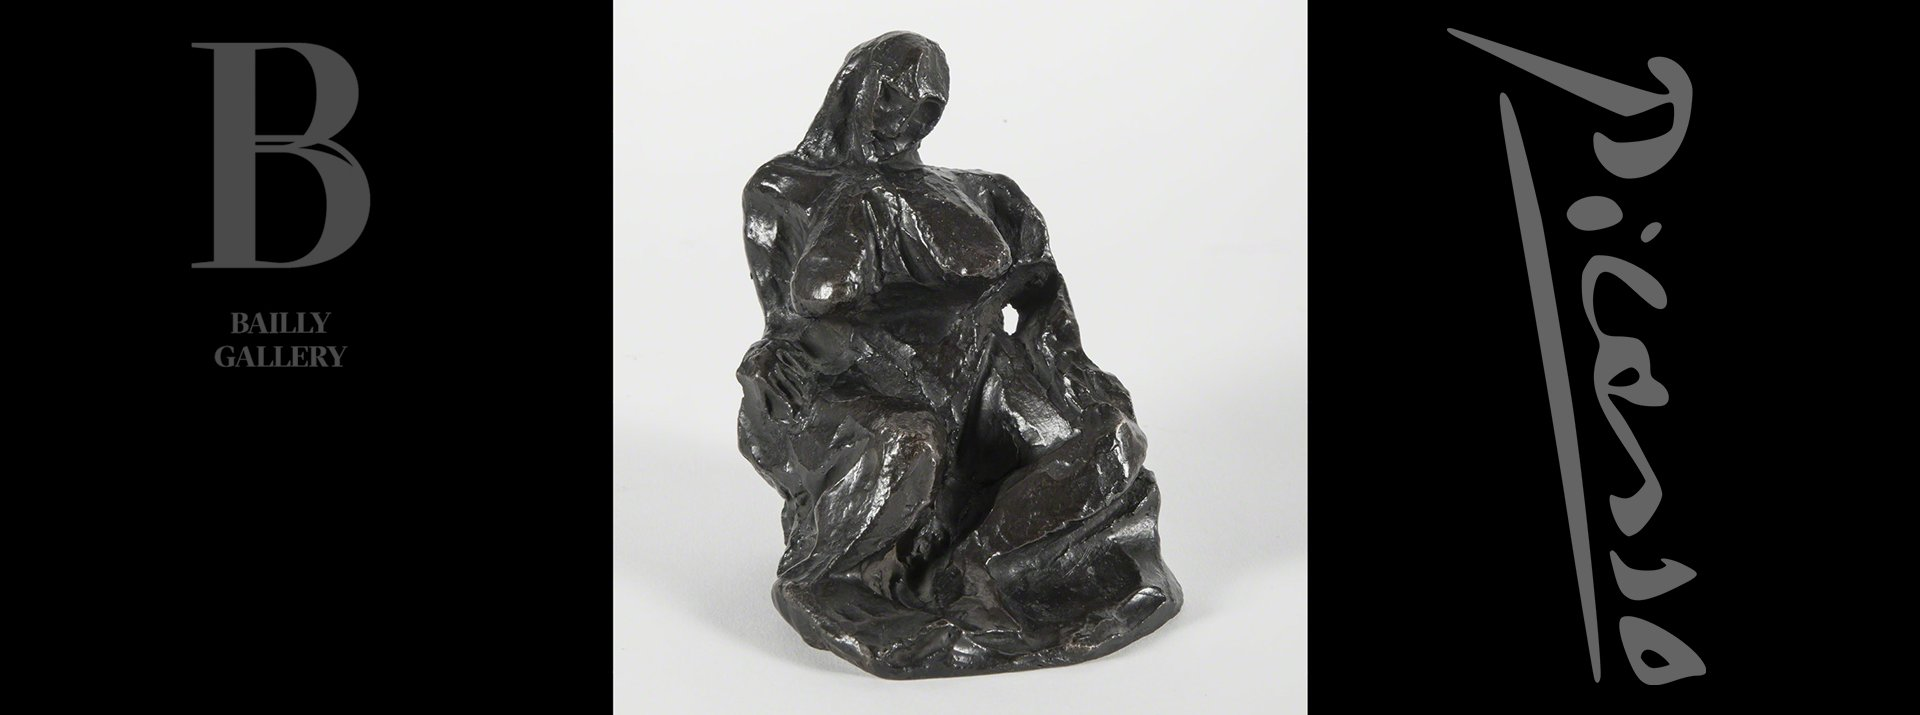 pablo-picasso-bronze-proof.jpg